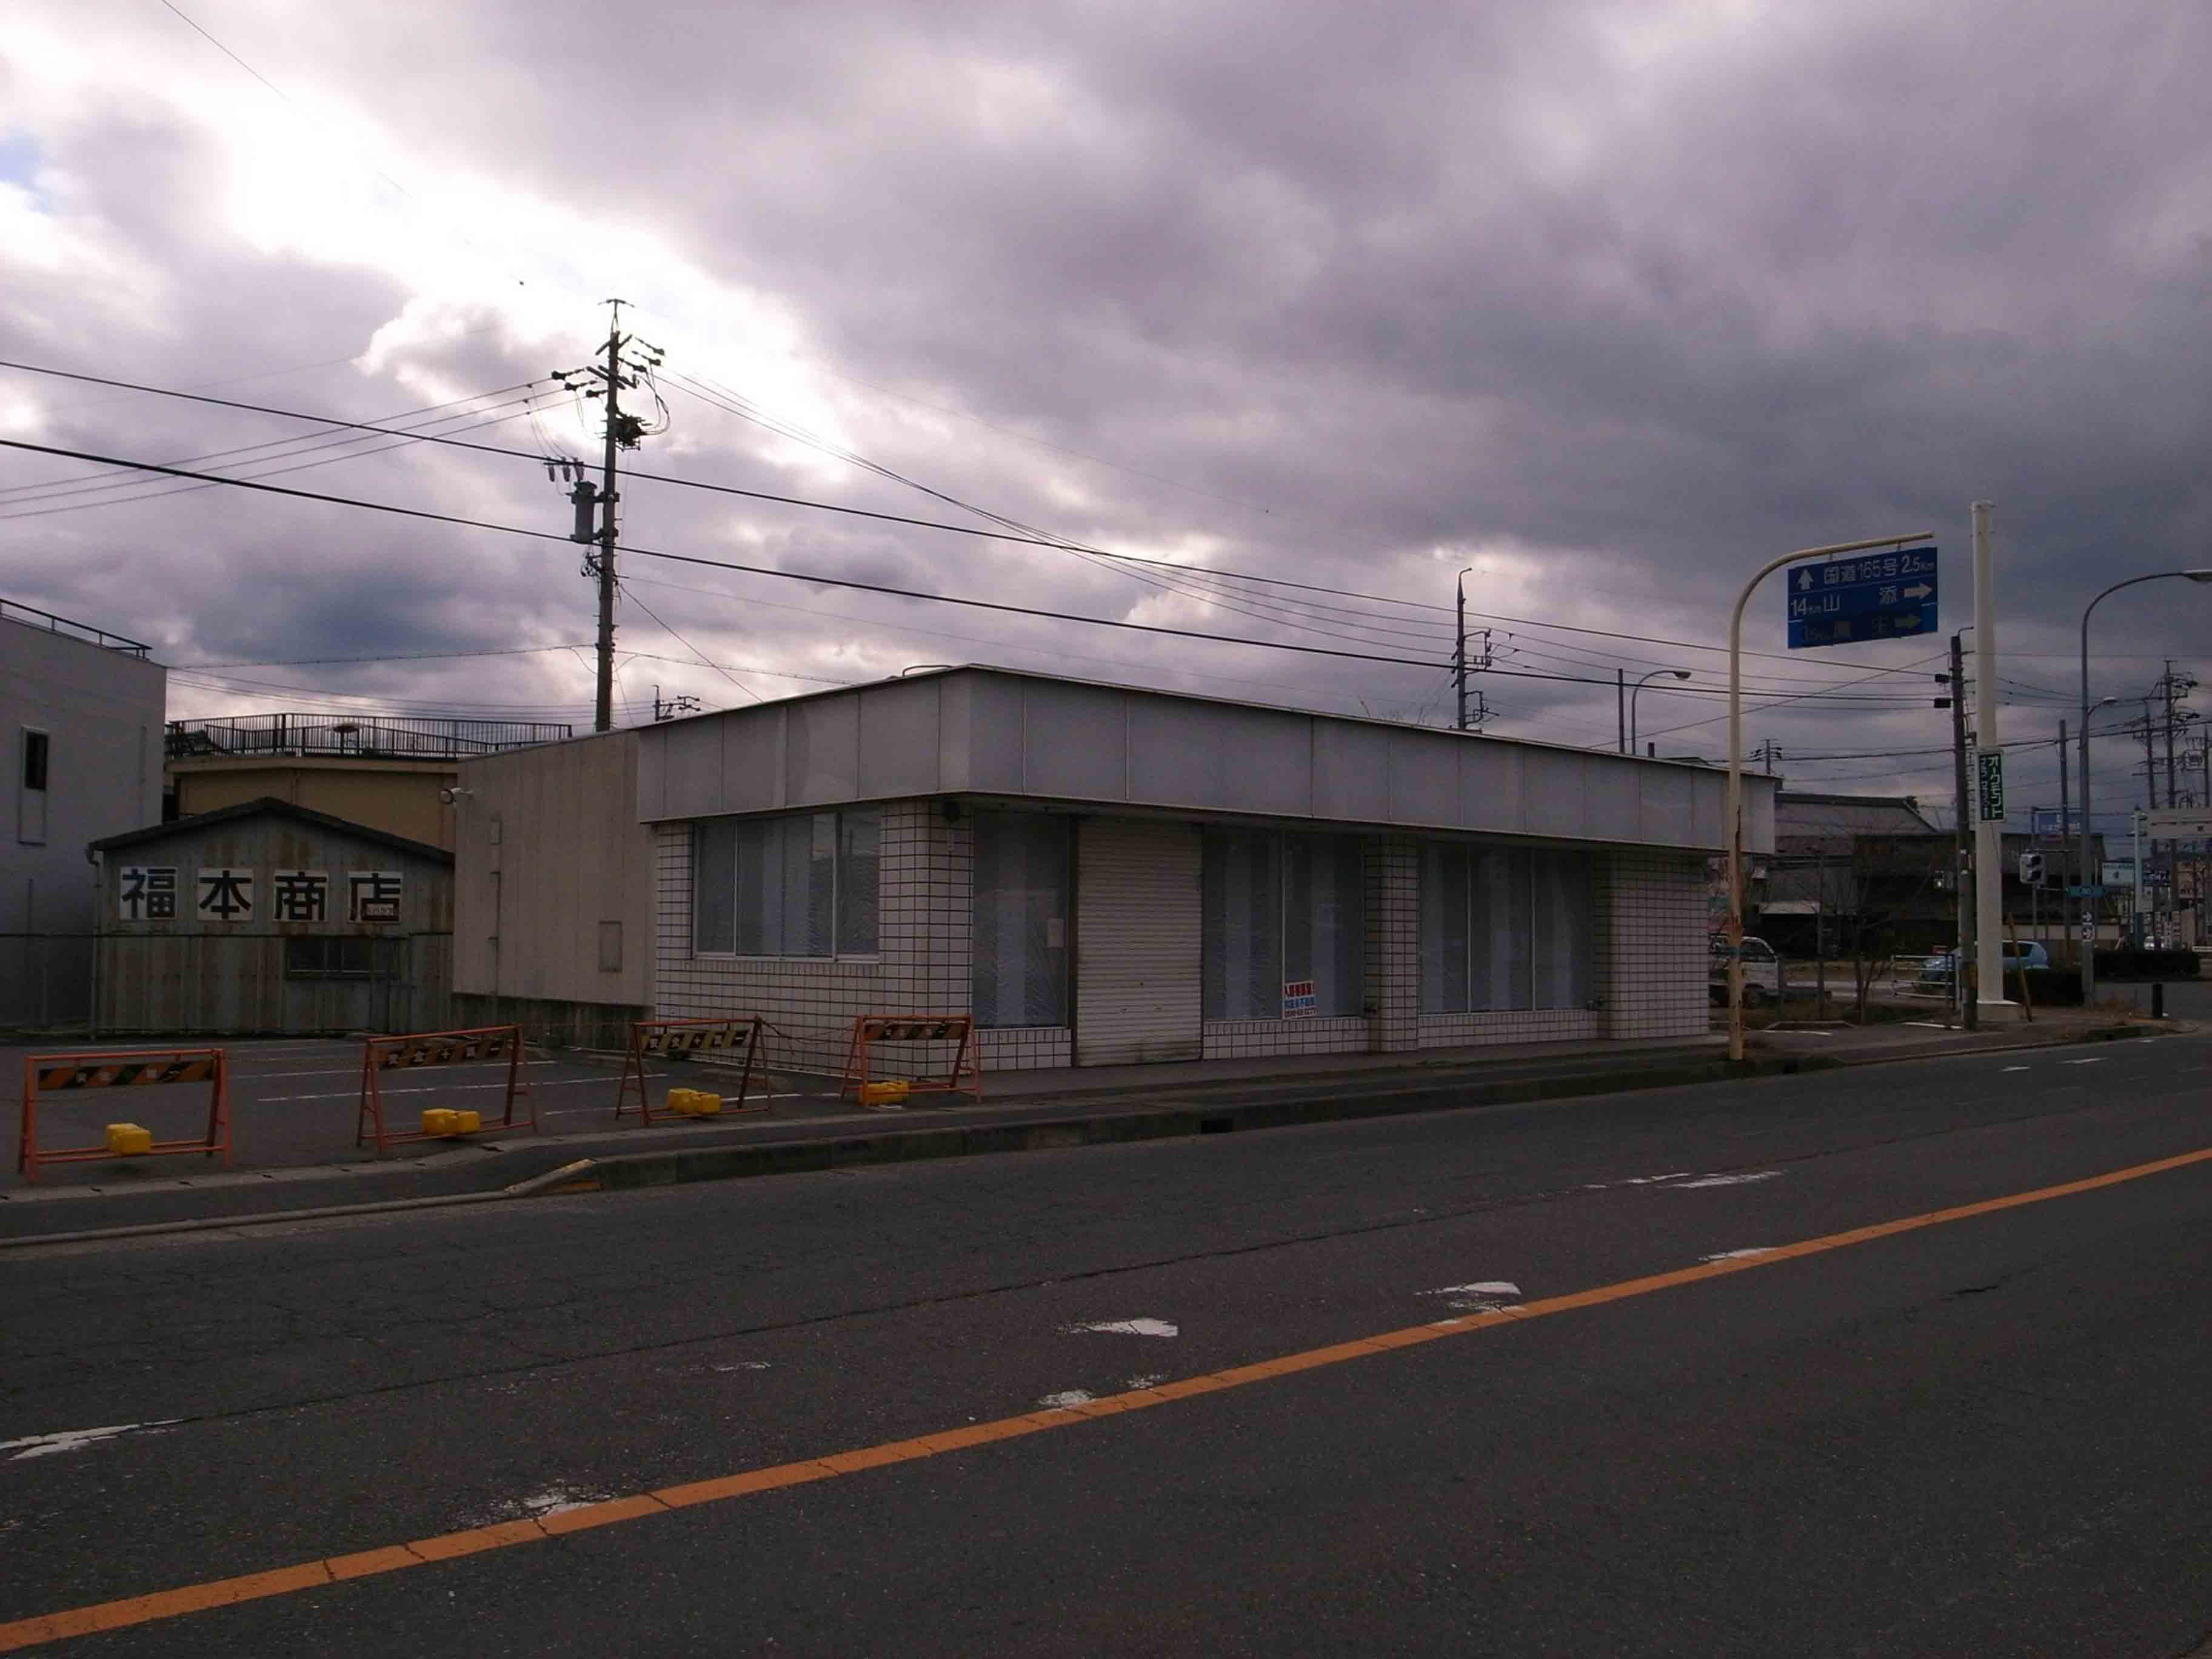 http://file.okkoto.blog.shinobi.jp/XX.jpg